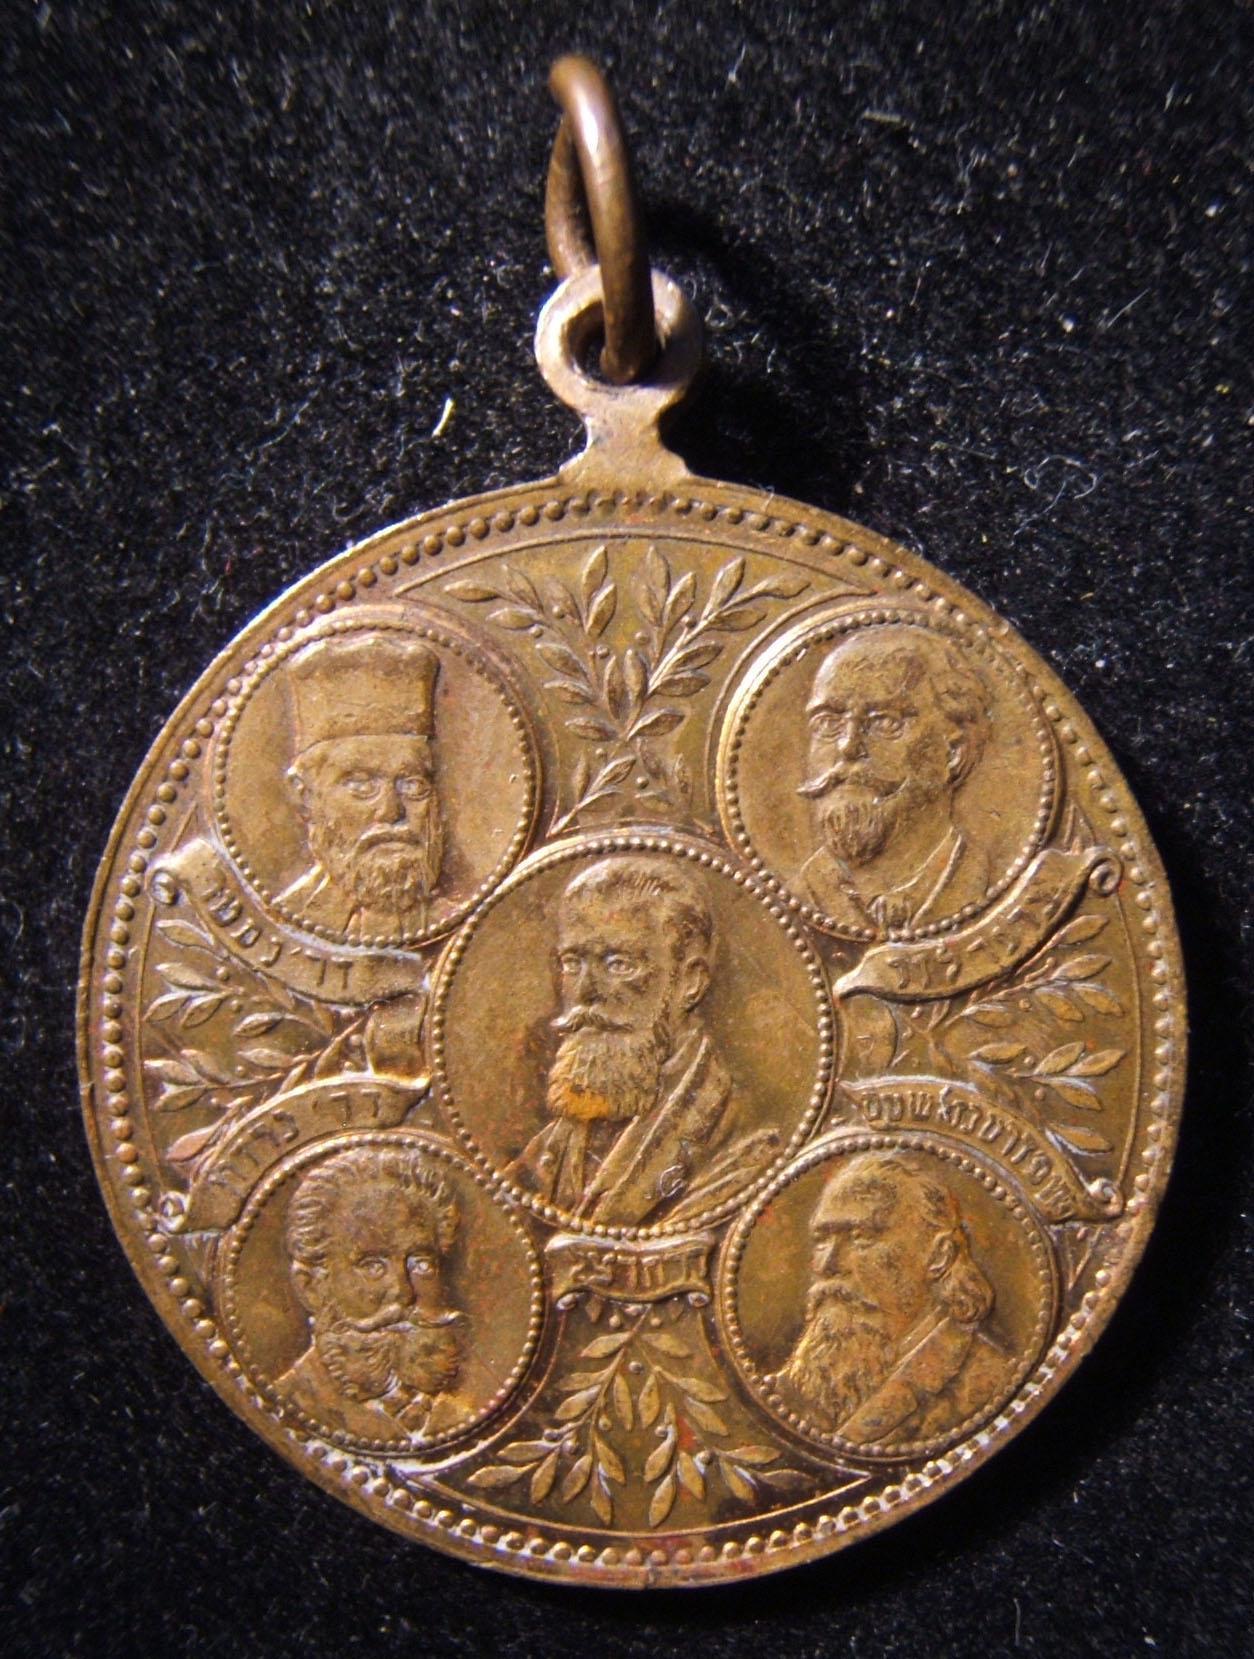 Switzerland(?): 2nd Zionist Congress Praesidium tallion, 1898; bronze; not maker-marked; size: 28.5mm x 38mm; weight: 8.45g. Obv.: 5 portraits w/Yiddish names in Heb.,